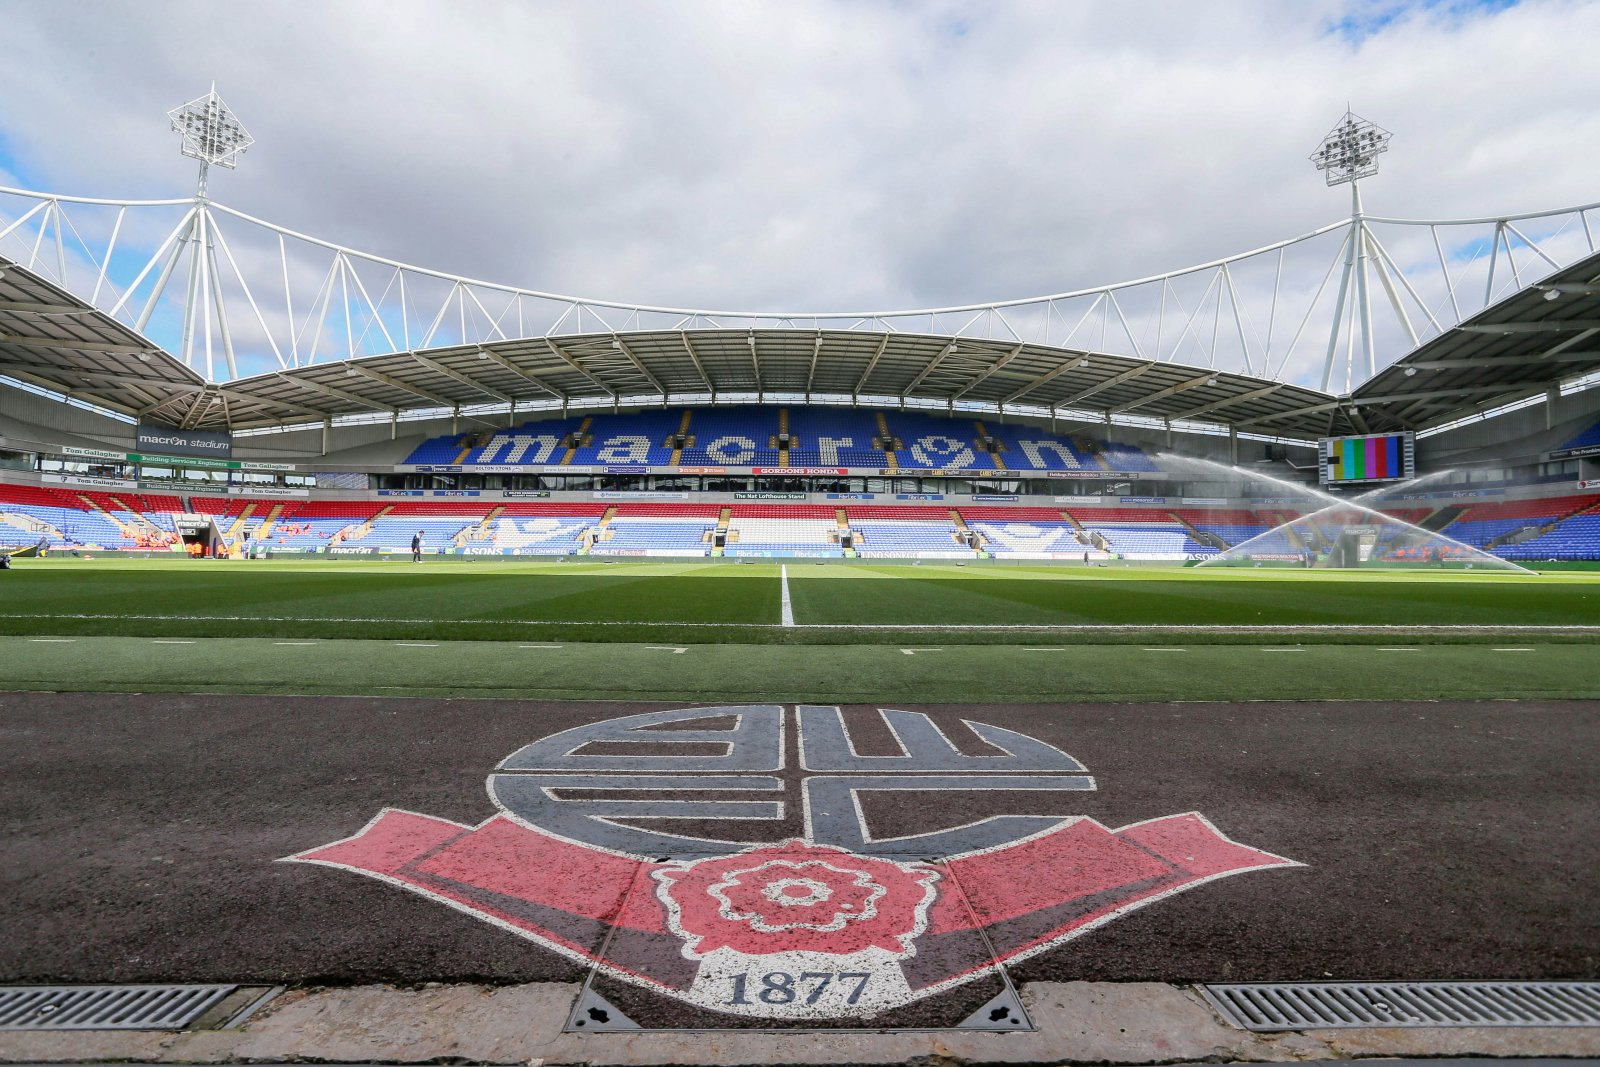 Image via Bolton Wanderers